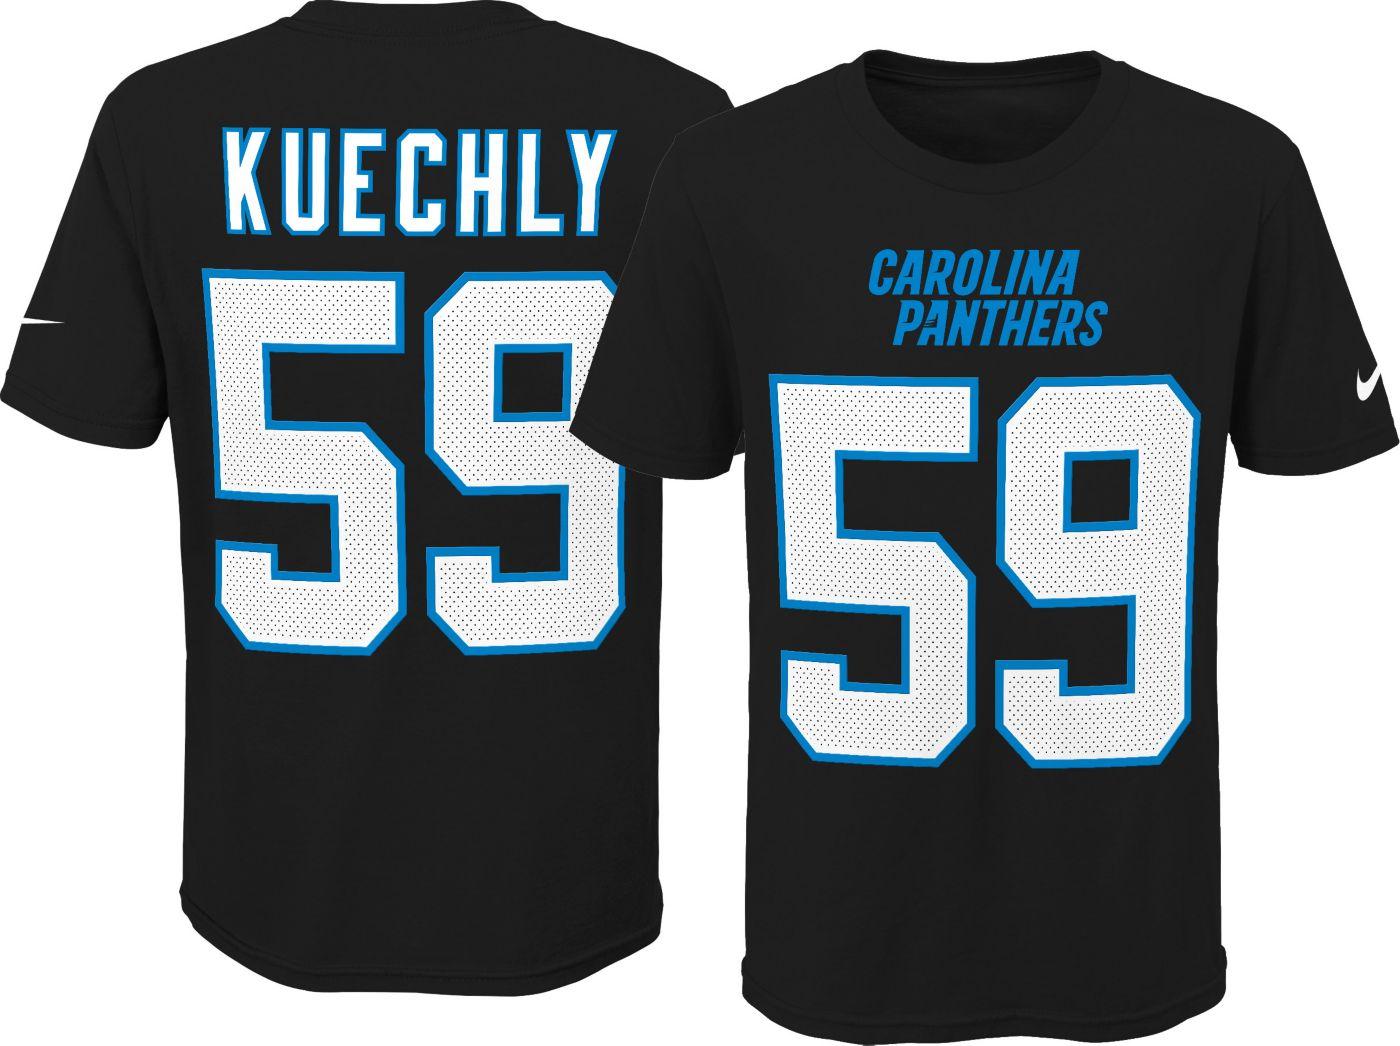 Nike Youth Carolina Panthers Luke Kuechly #59 Pride Black Player T-Shirt